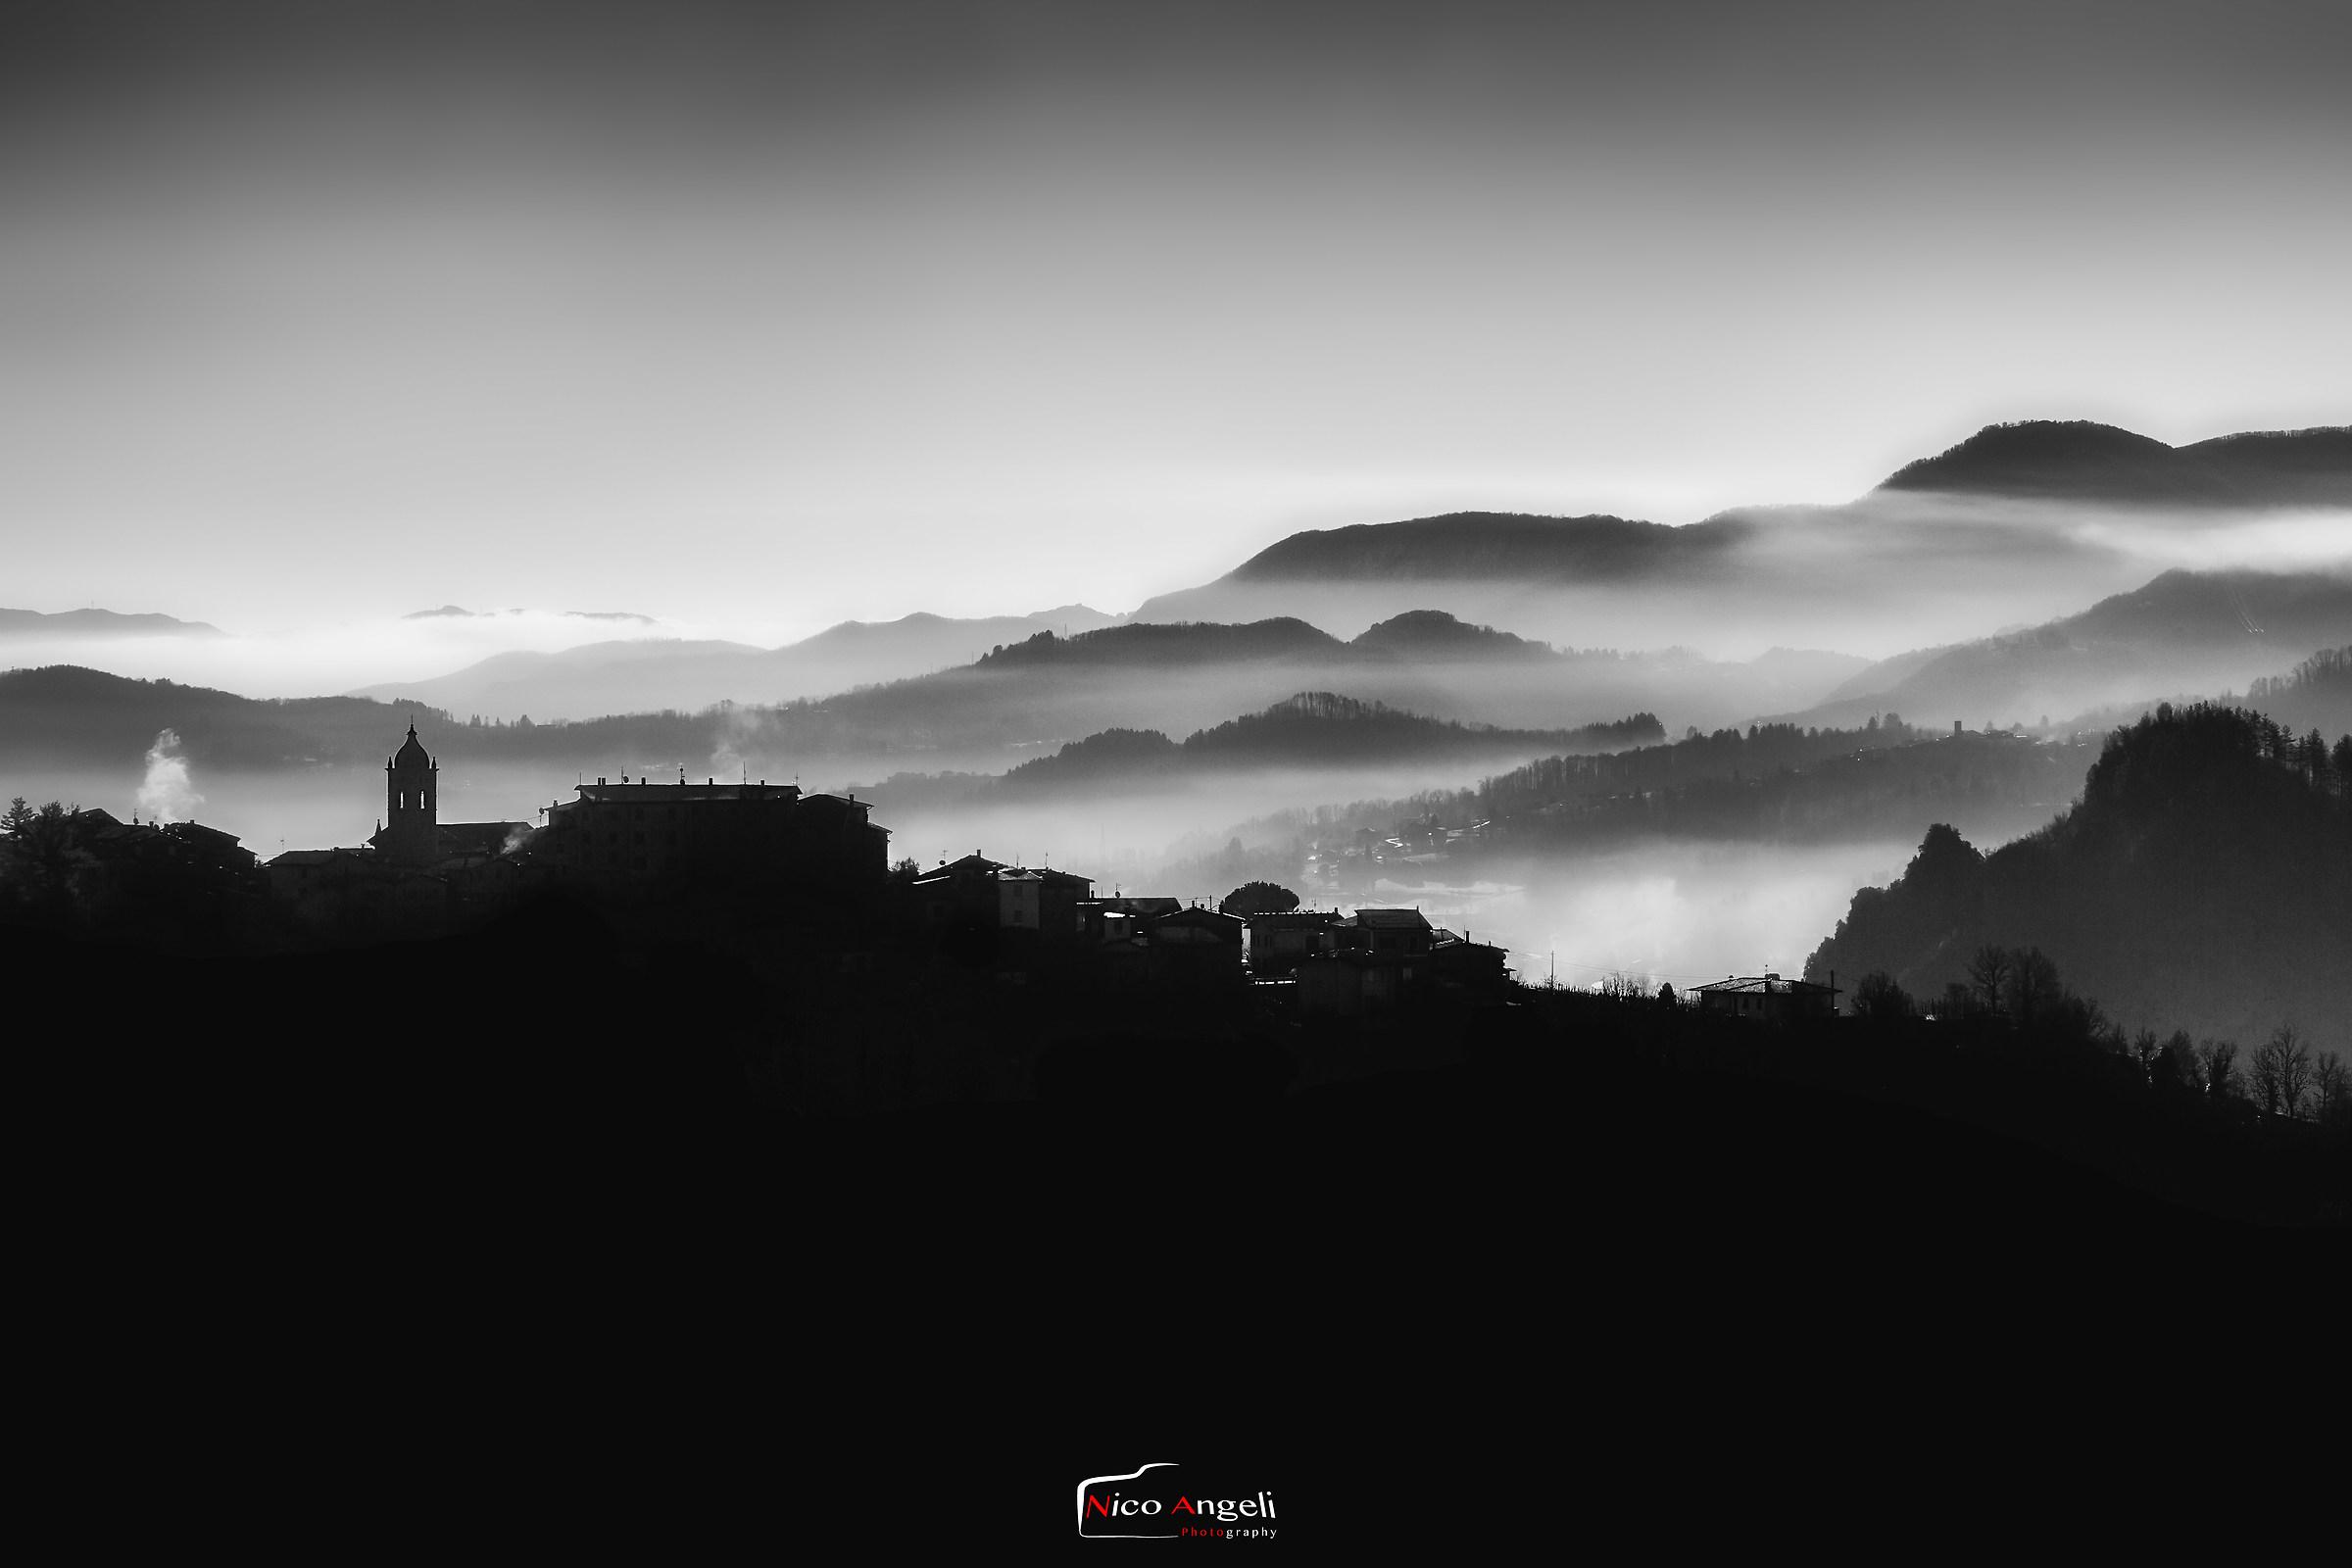 The cold mornings of the Garfagnana ...